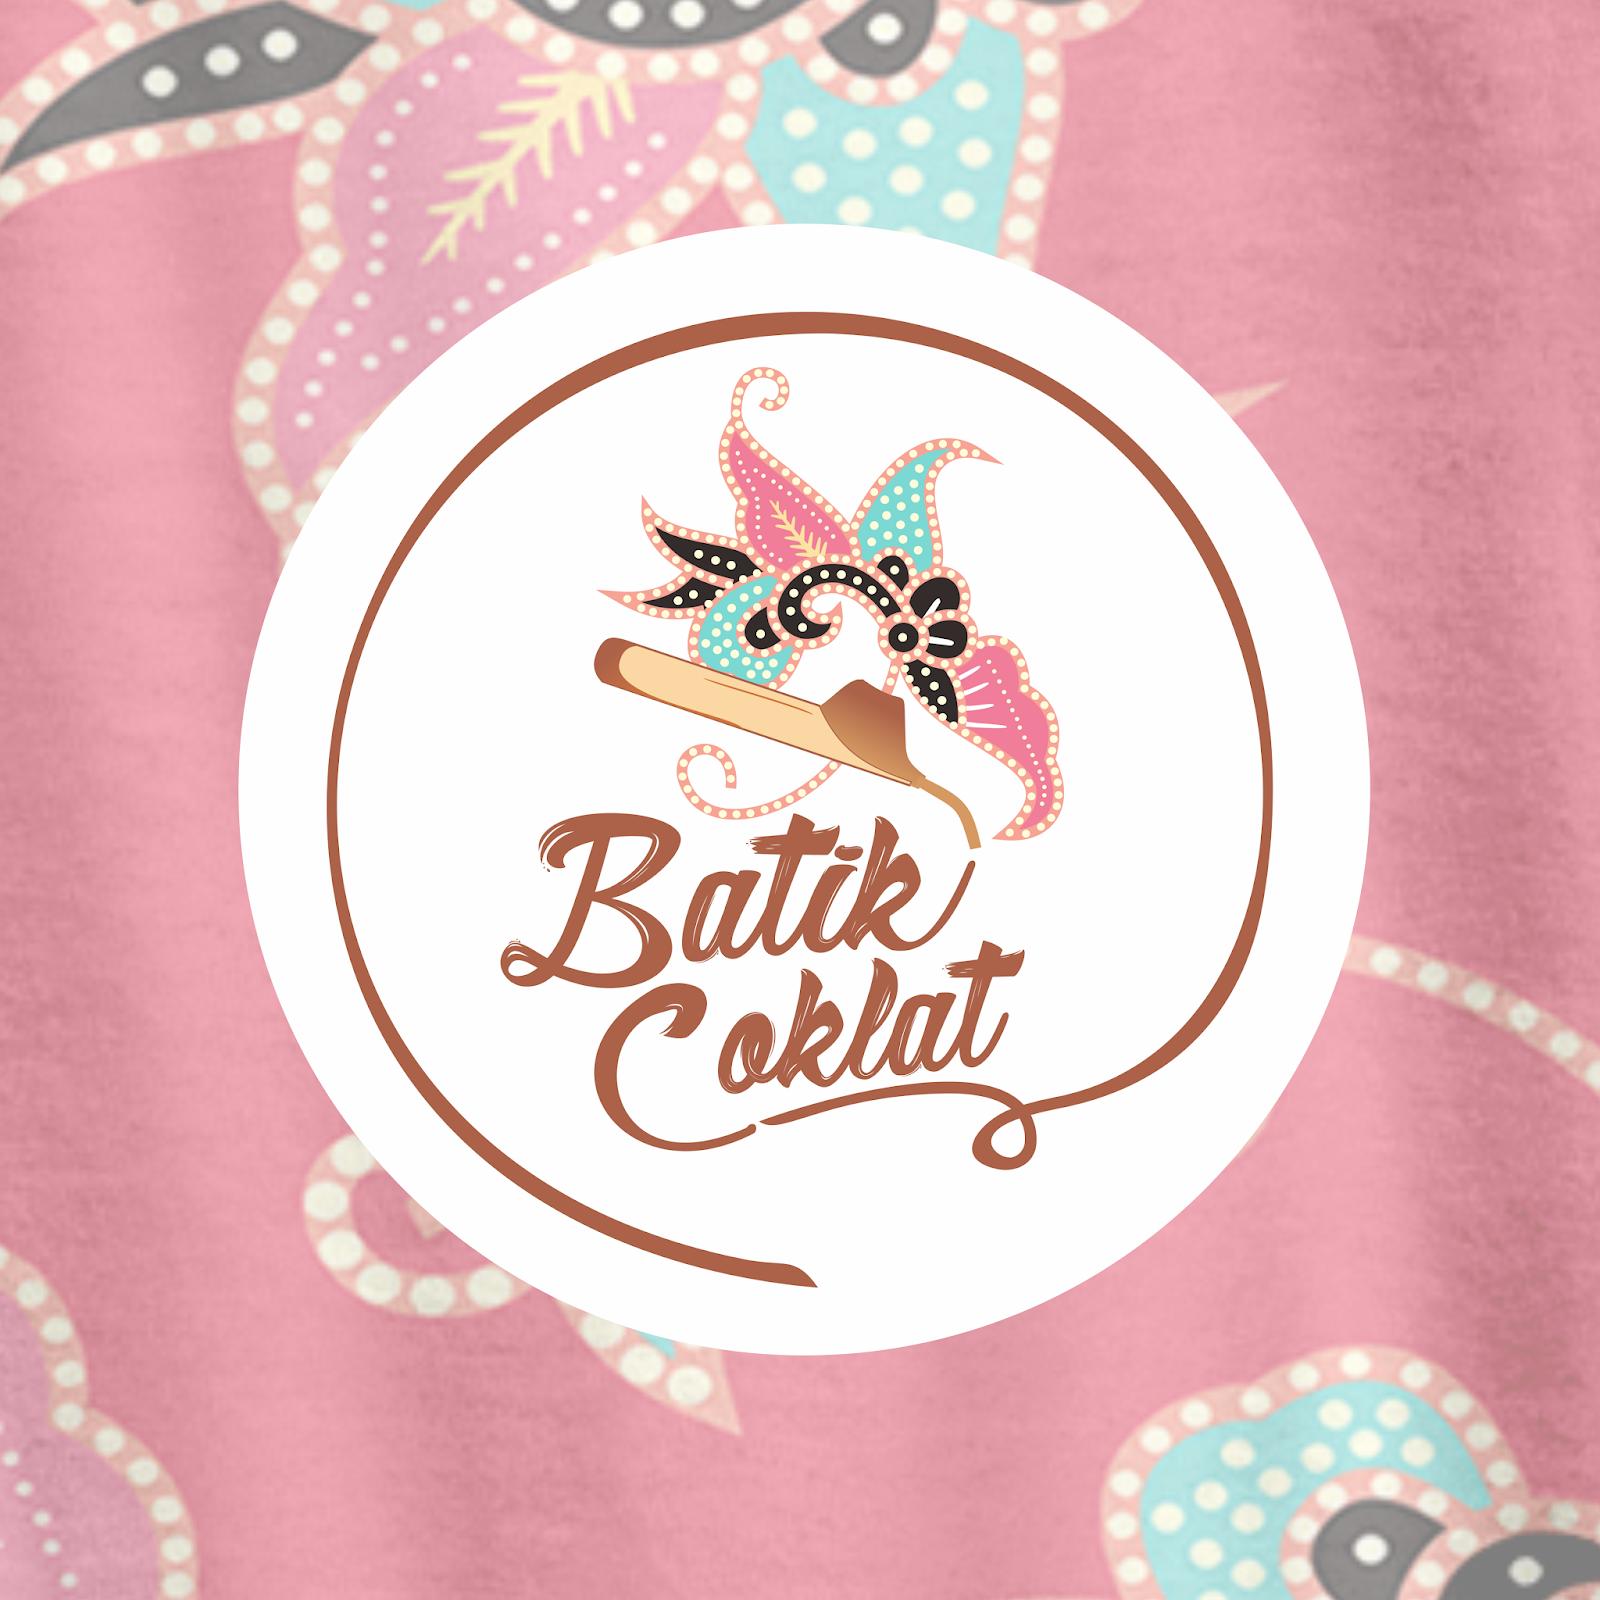 Desain Kemasancoreldraw:  Desain Logo Usaha Fashion Batik Coklat Kebun Design Branding